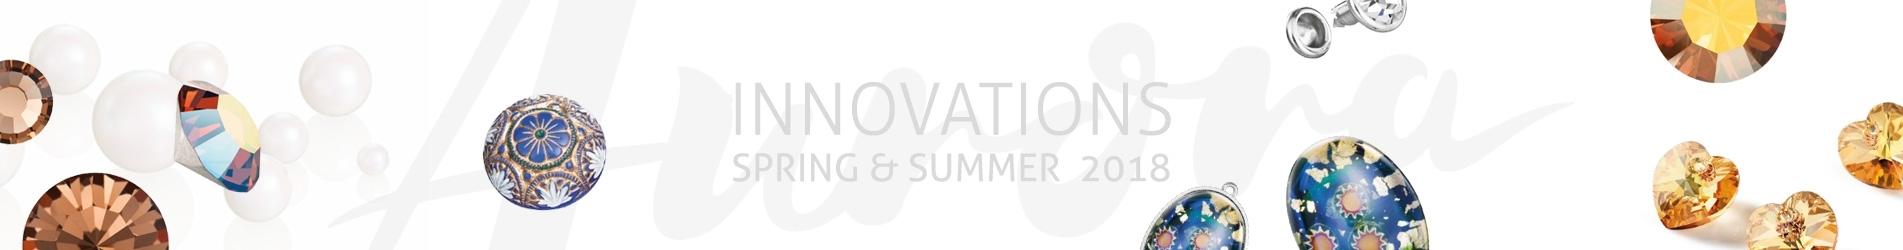 Preciosa Innovations Frühjahr/Sommer 2018